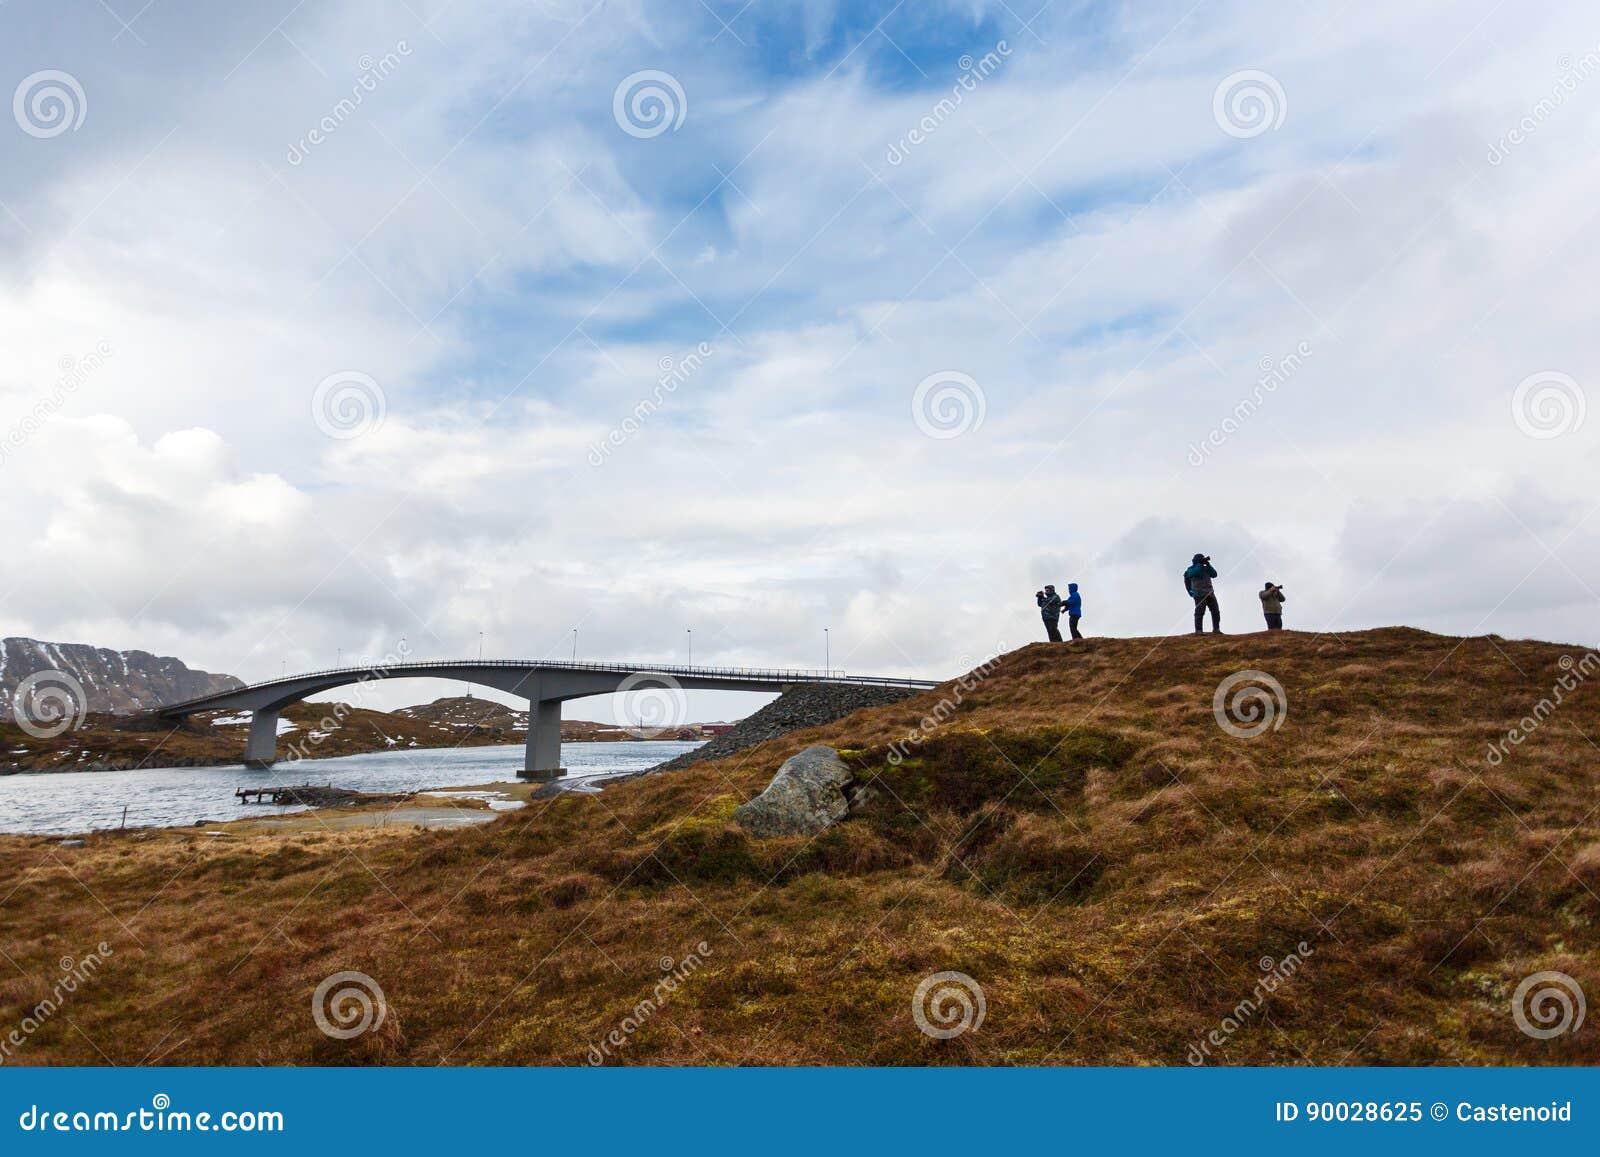 Los fotógrafos están viajando a Lofoten